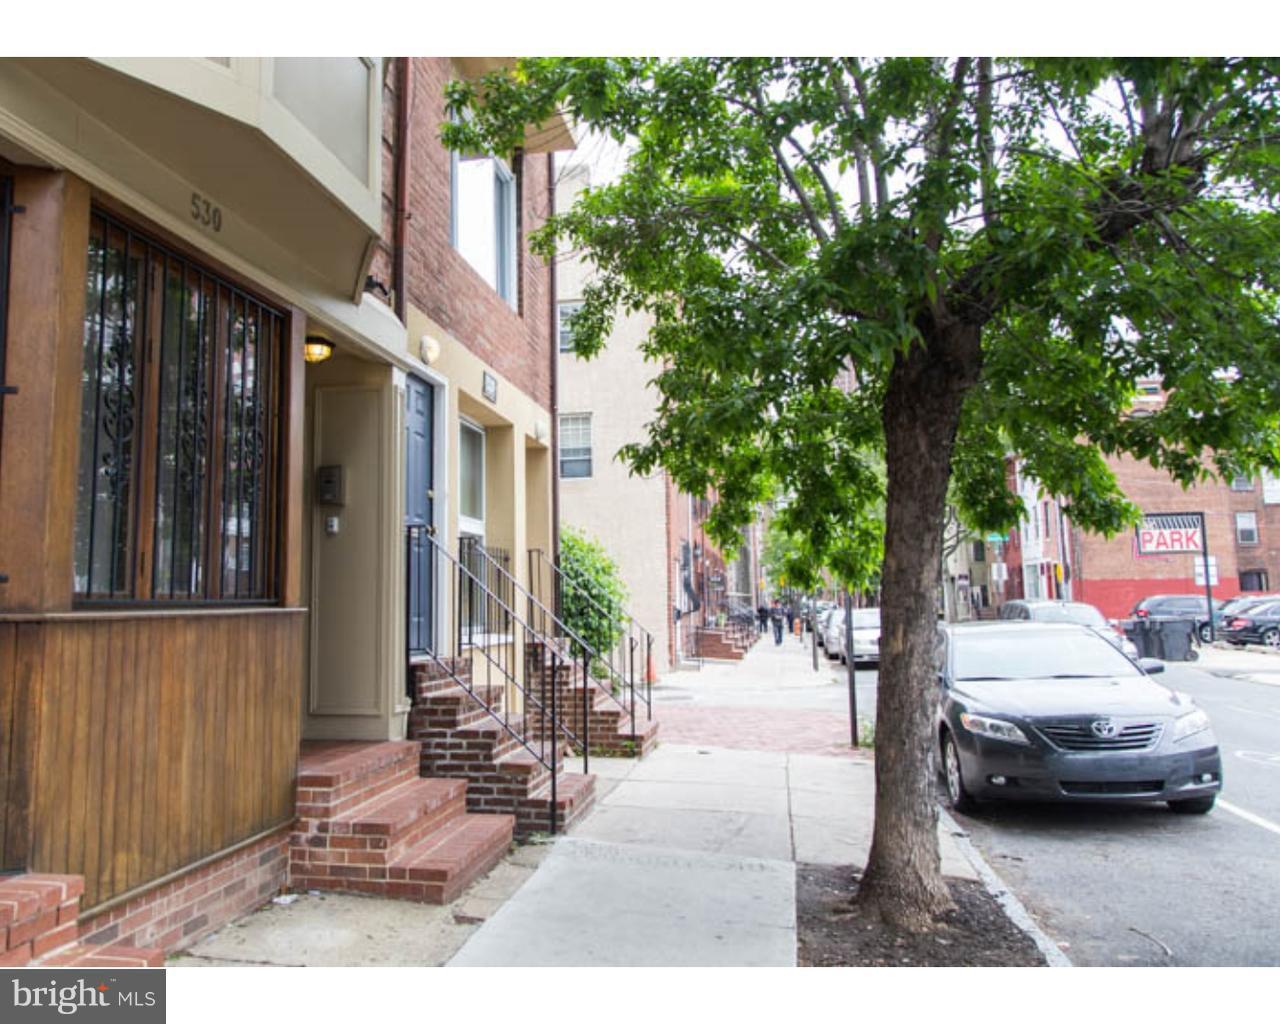 530 S 15TH Street #2 Philadelphia, PA 19146